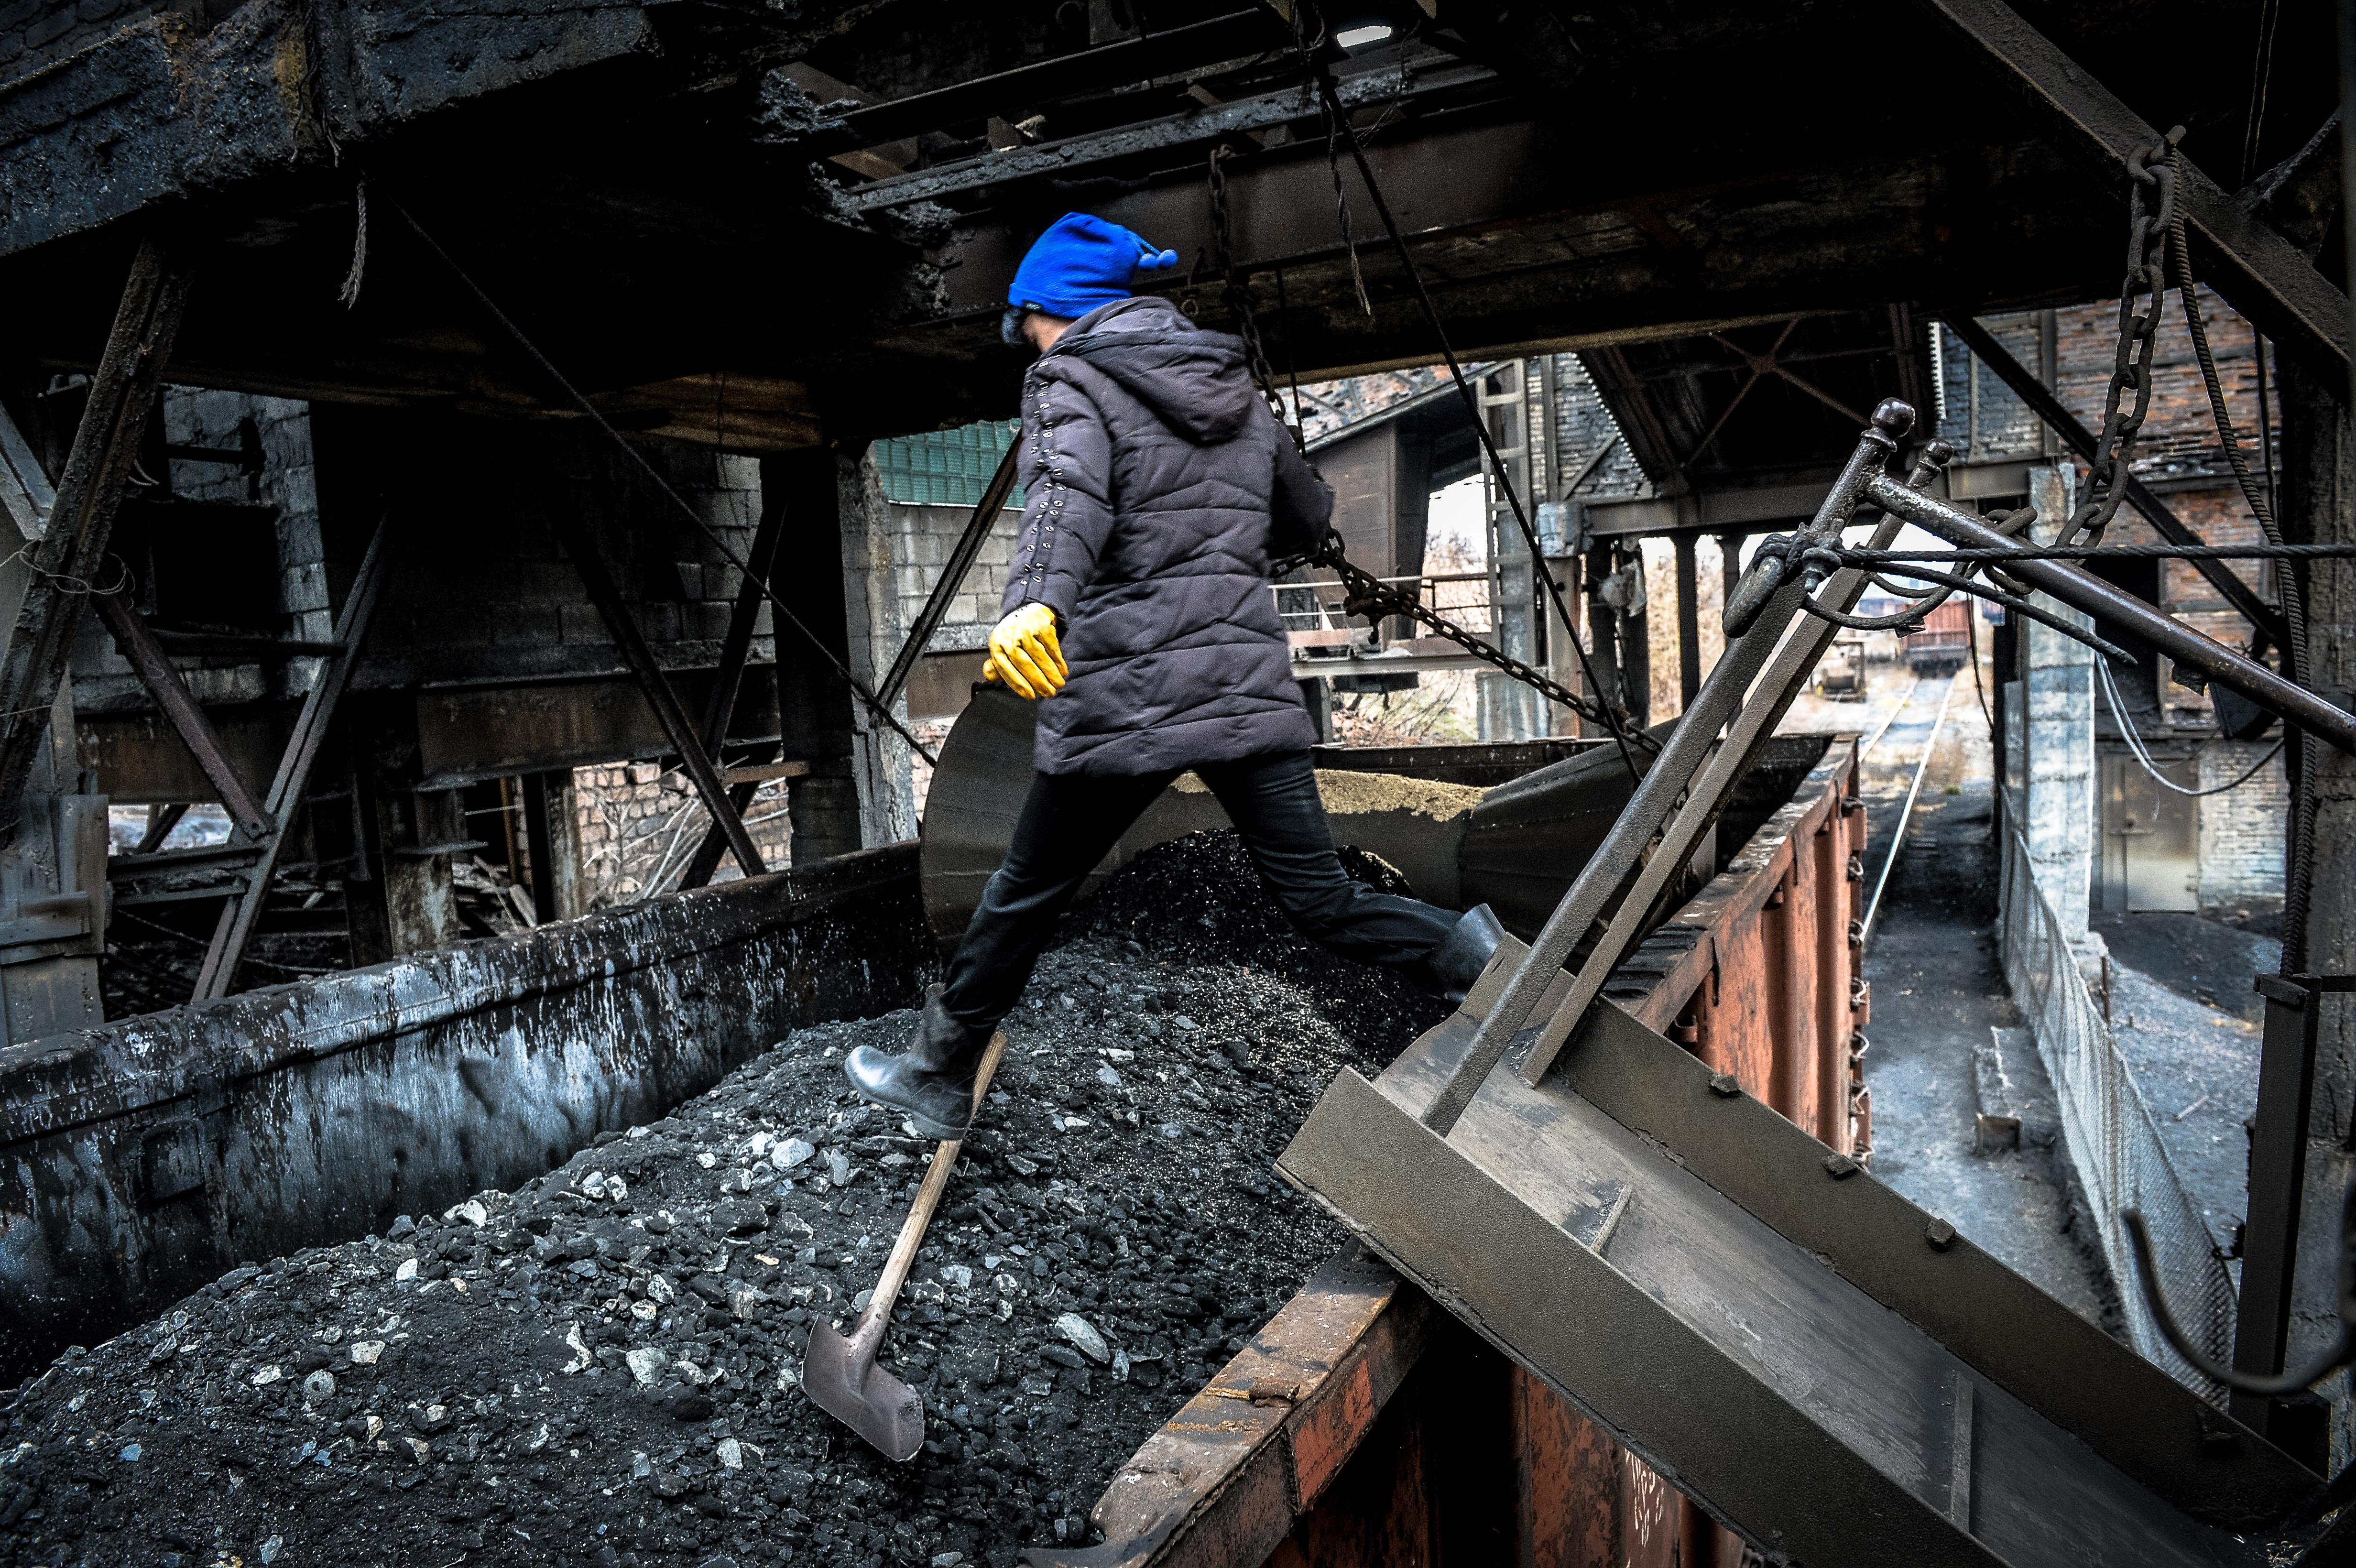 <p><span>Отгрузка угля в вагоны на шахте имени Челюскинцев в Донецке. Фото: &copy; РИА Новости/Алексей Куденко</span></p>